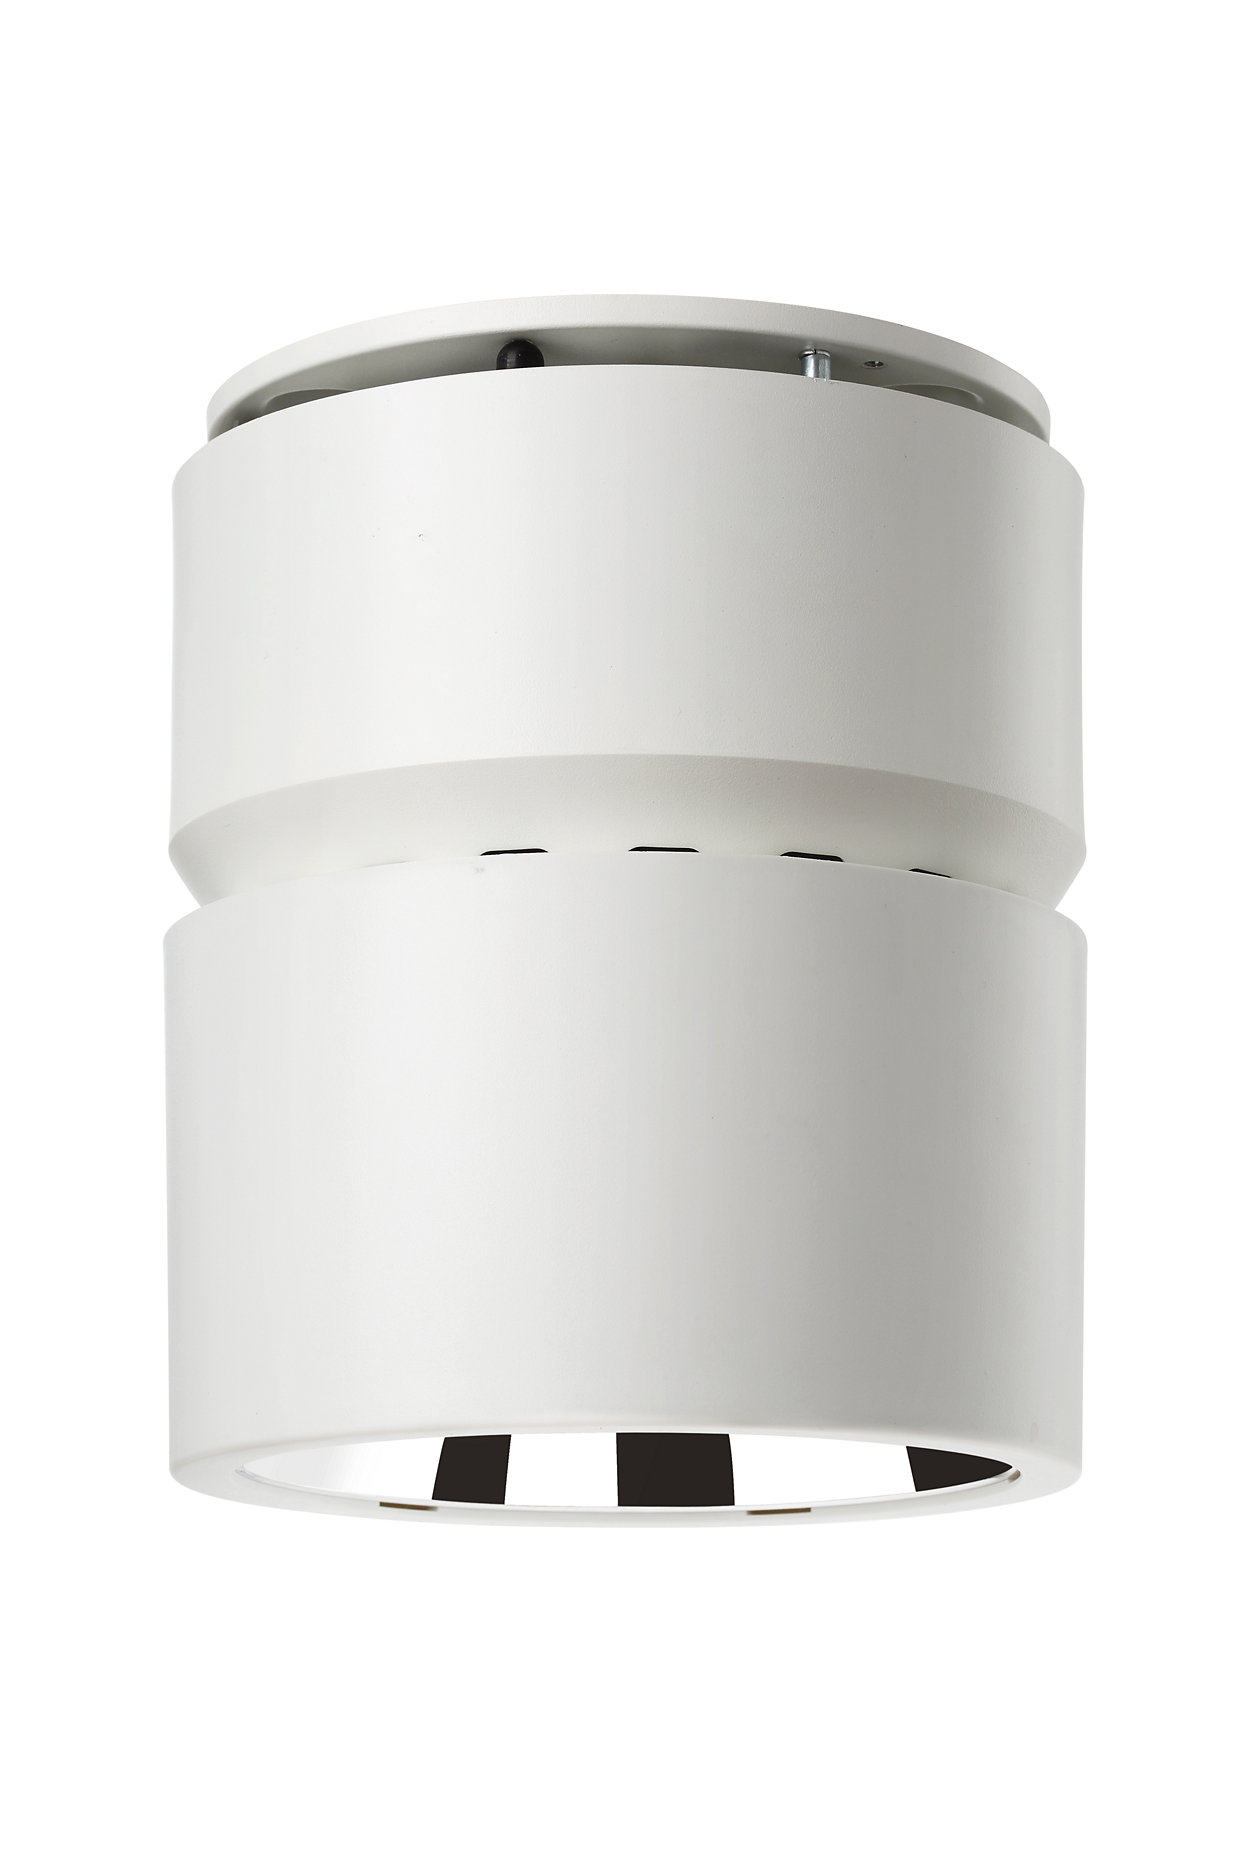 Un nuevo estándar en luces descendentes LED de montaje sobre superficie